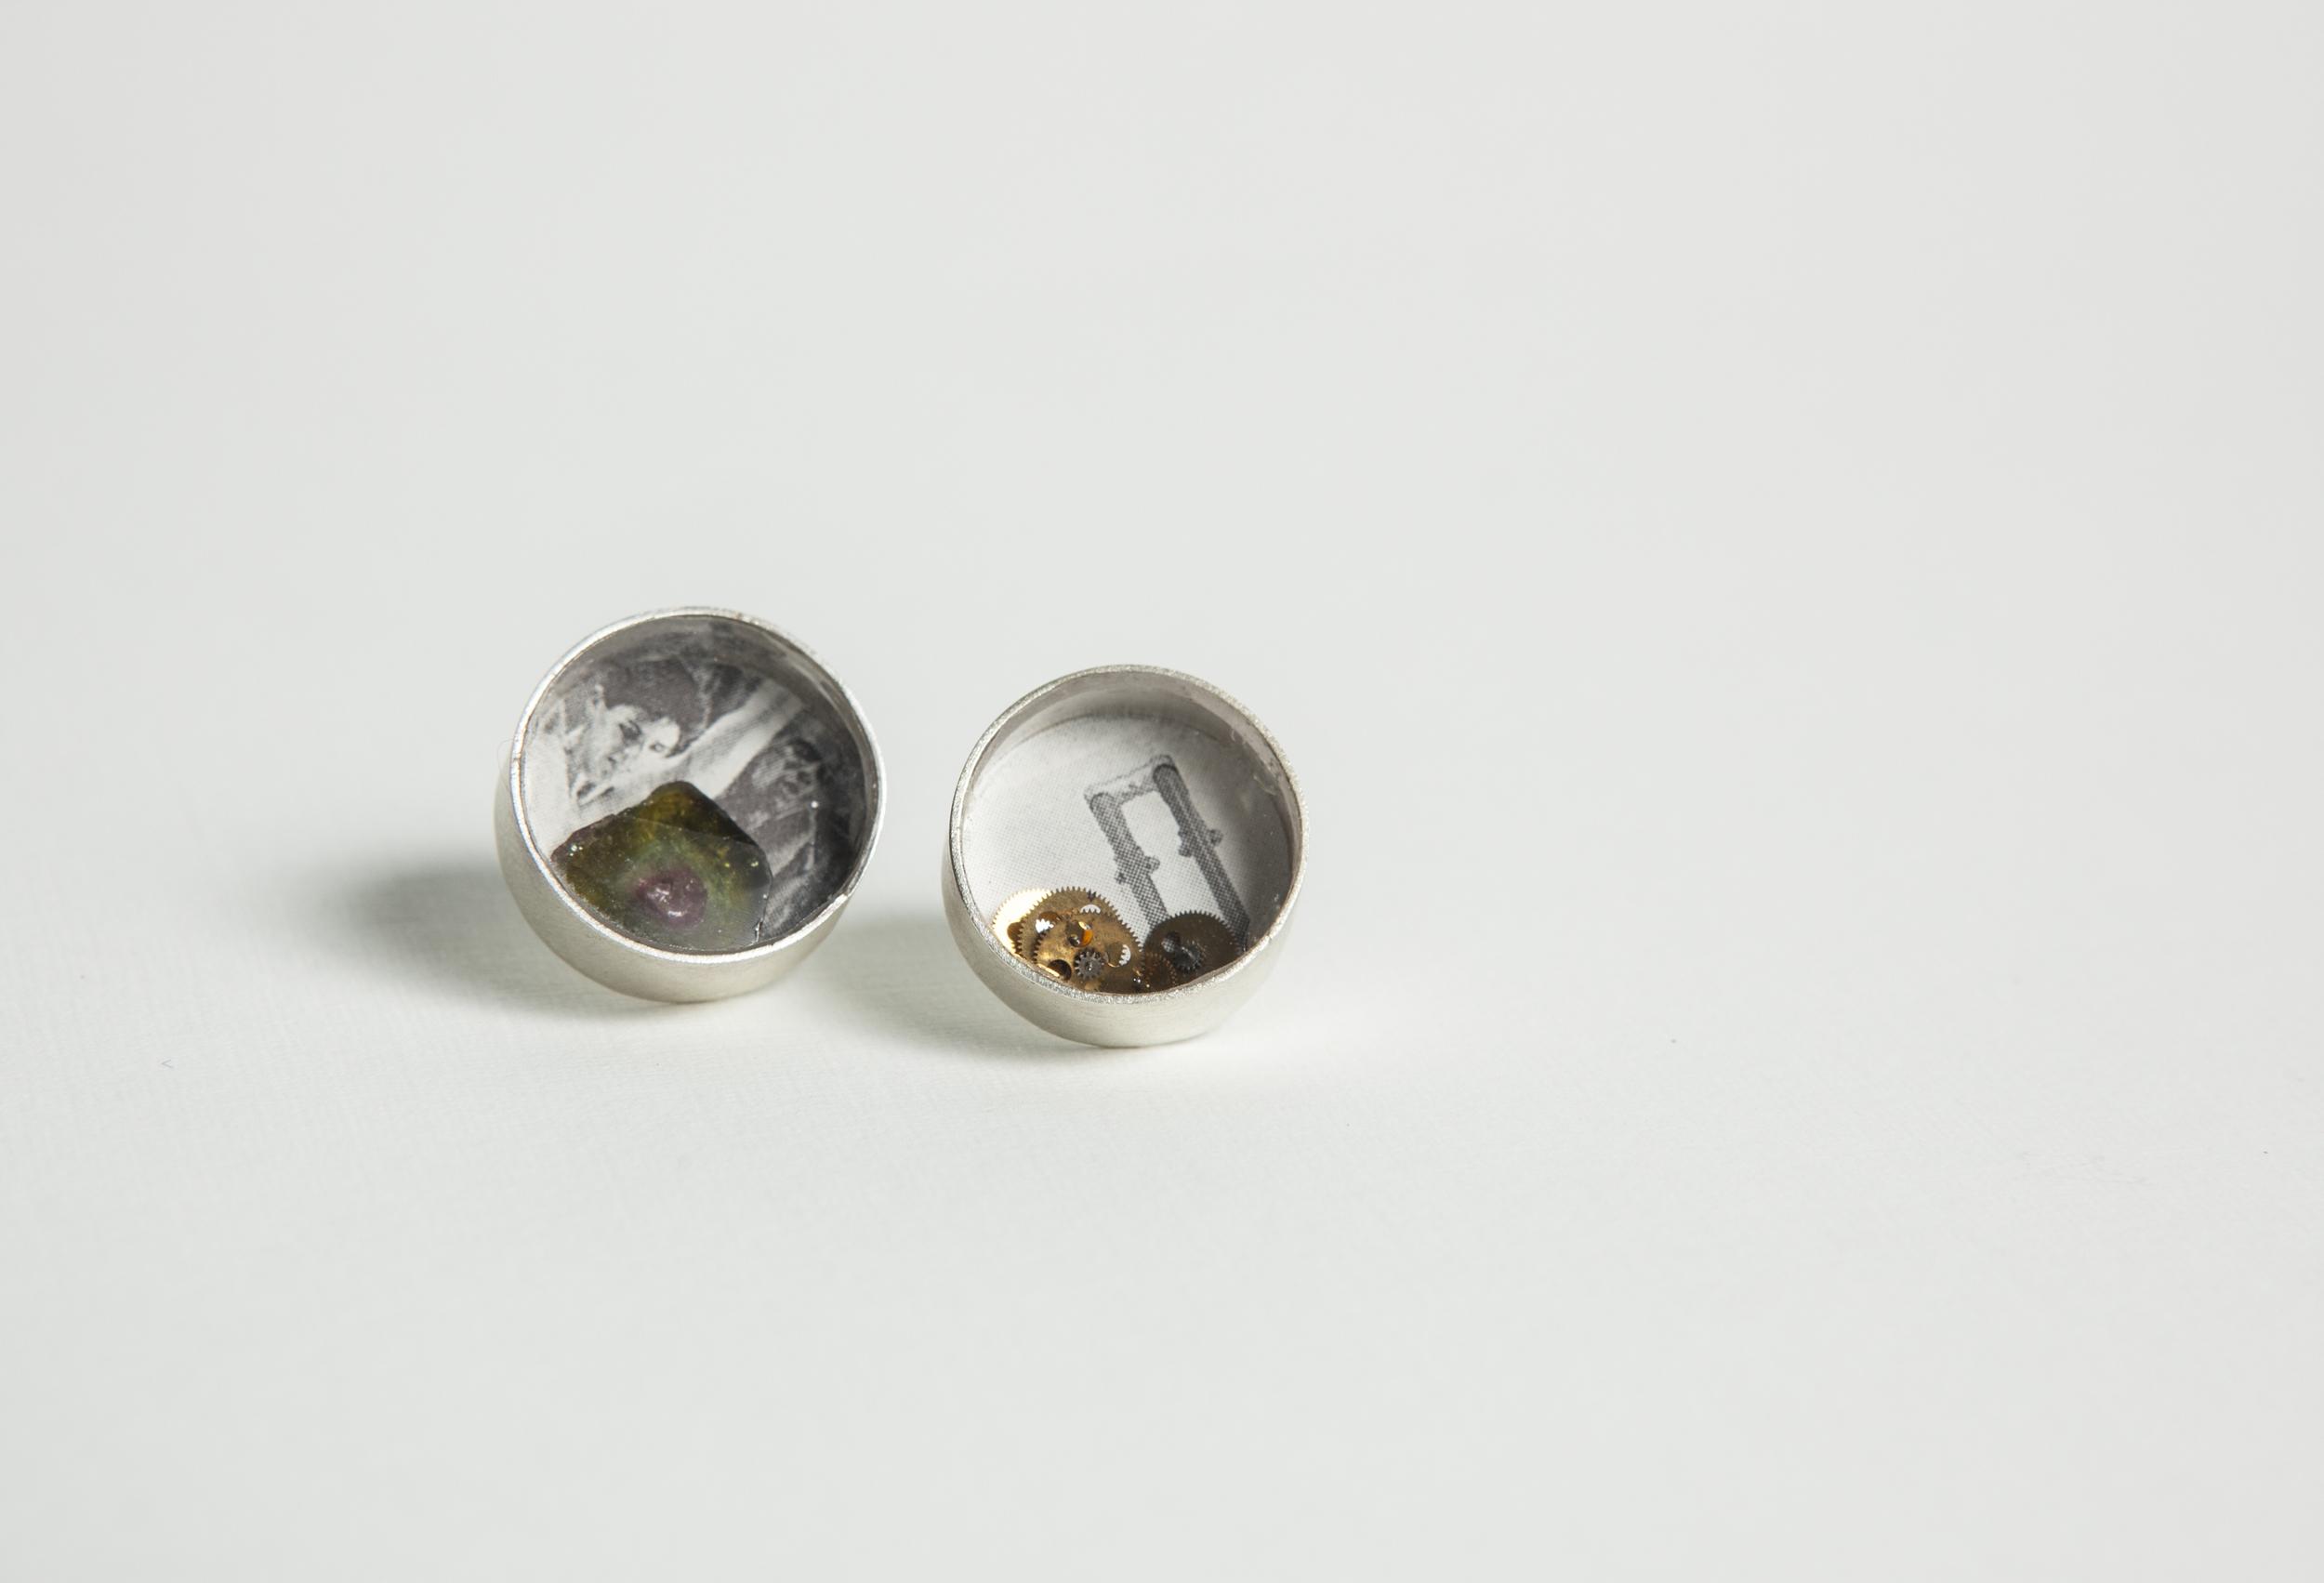 Earrings  Sterling silver, tourmaline, paper, watch parts.